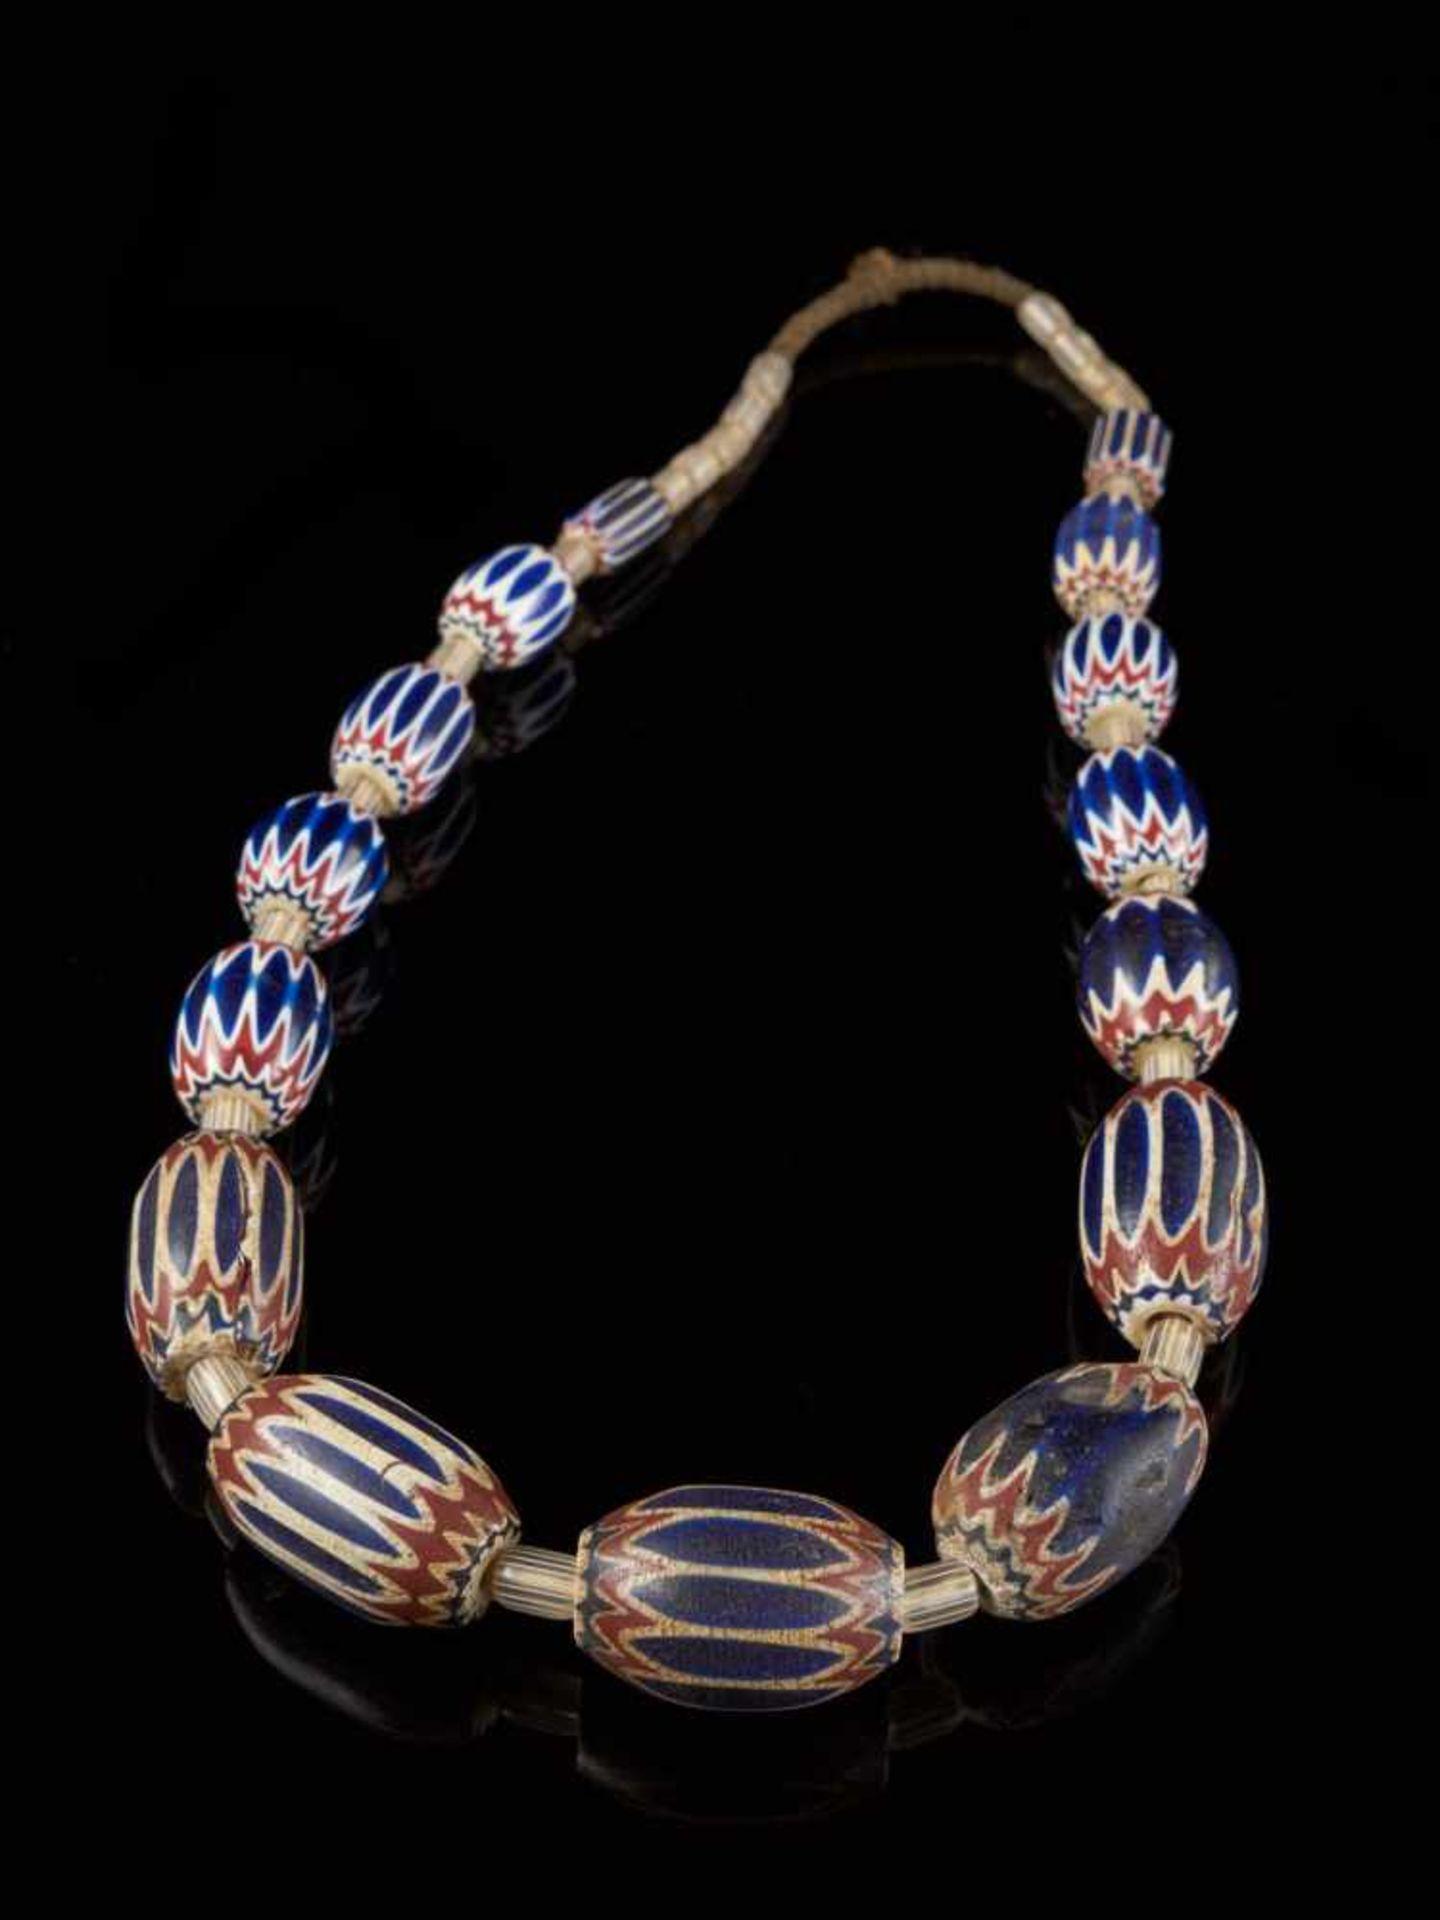 Traditional Bamileke 7 Layer Chevron Trade Bead Necklace Of 15 Beads. - Tribal ArtChevrons beads are - Bild 2 aus 5